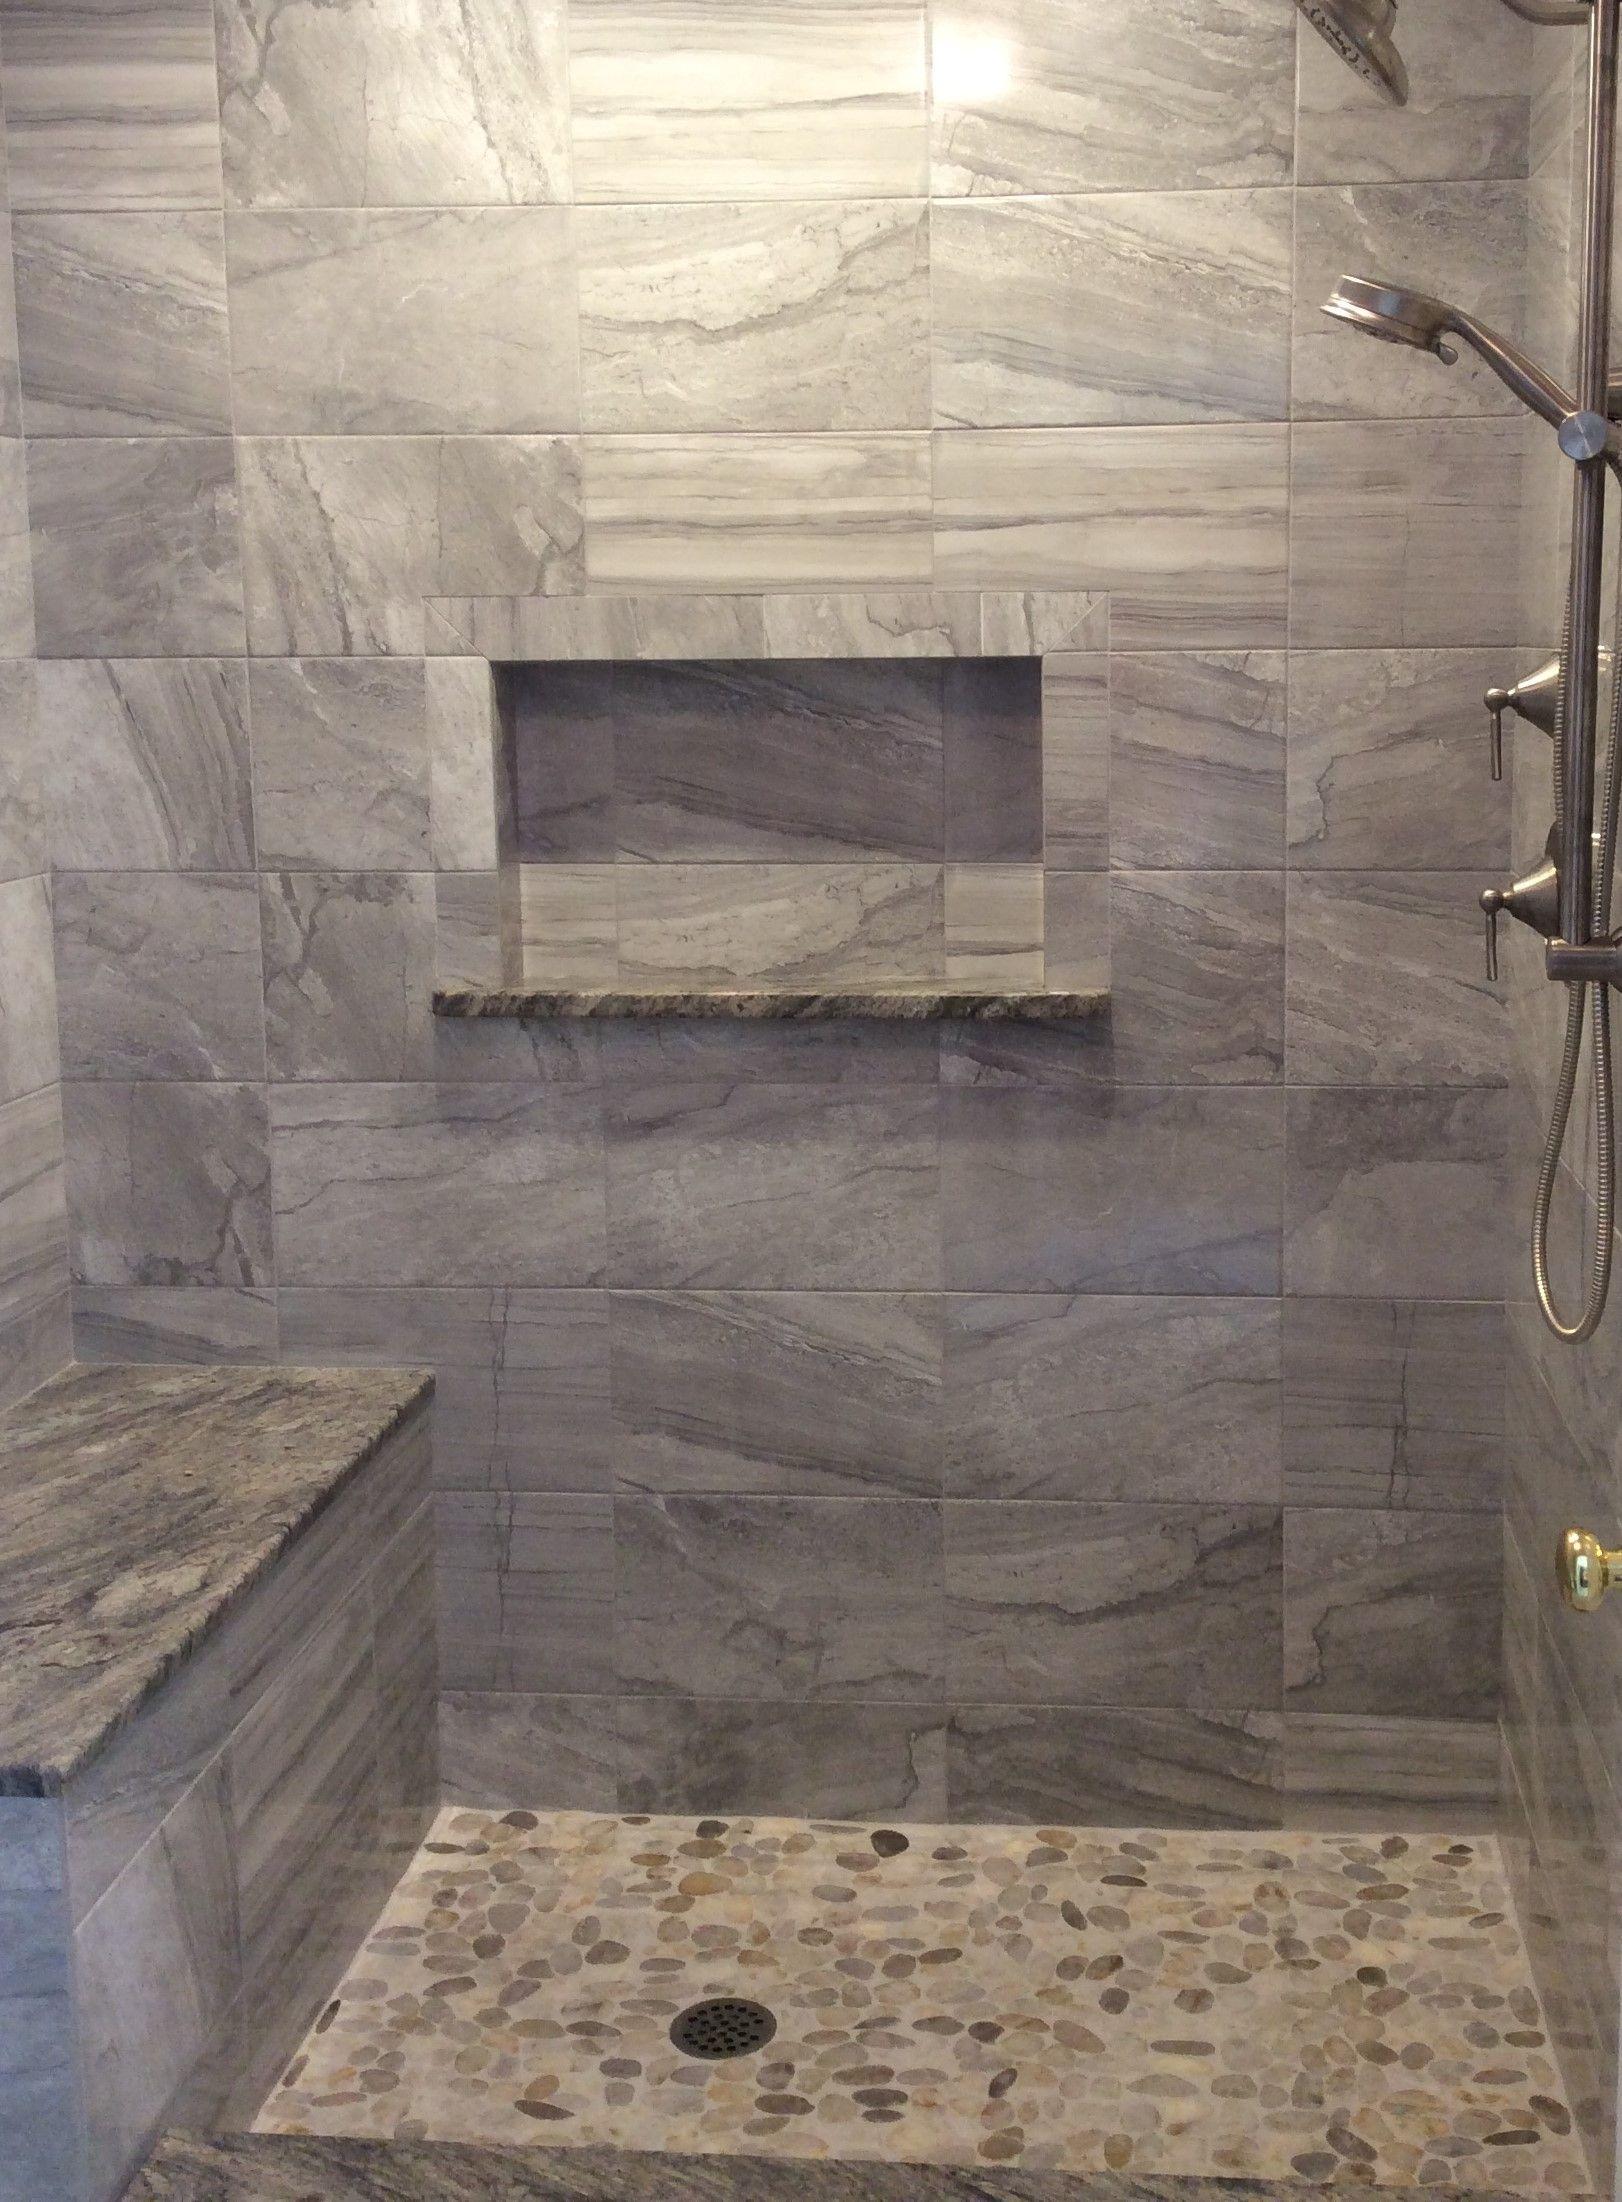 pebble rock shower floor and tile in